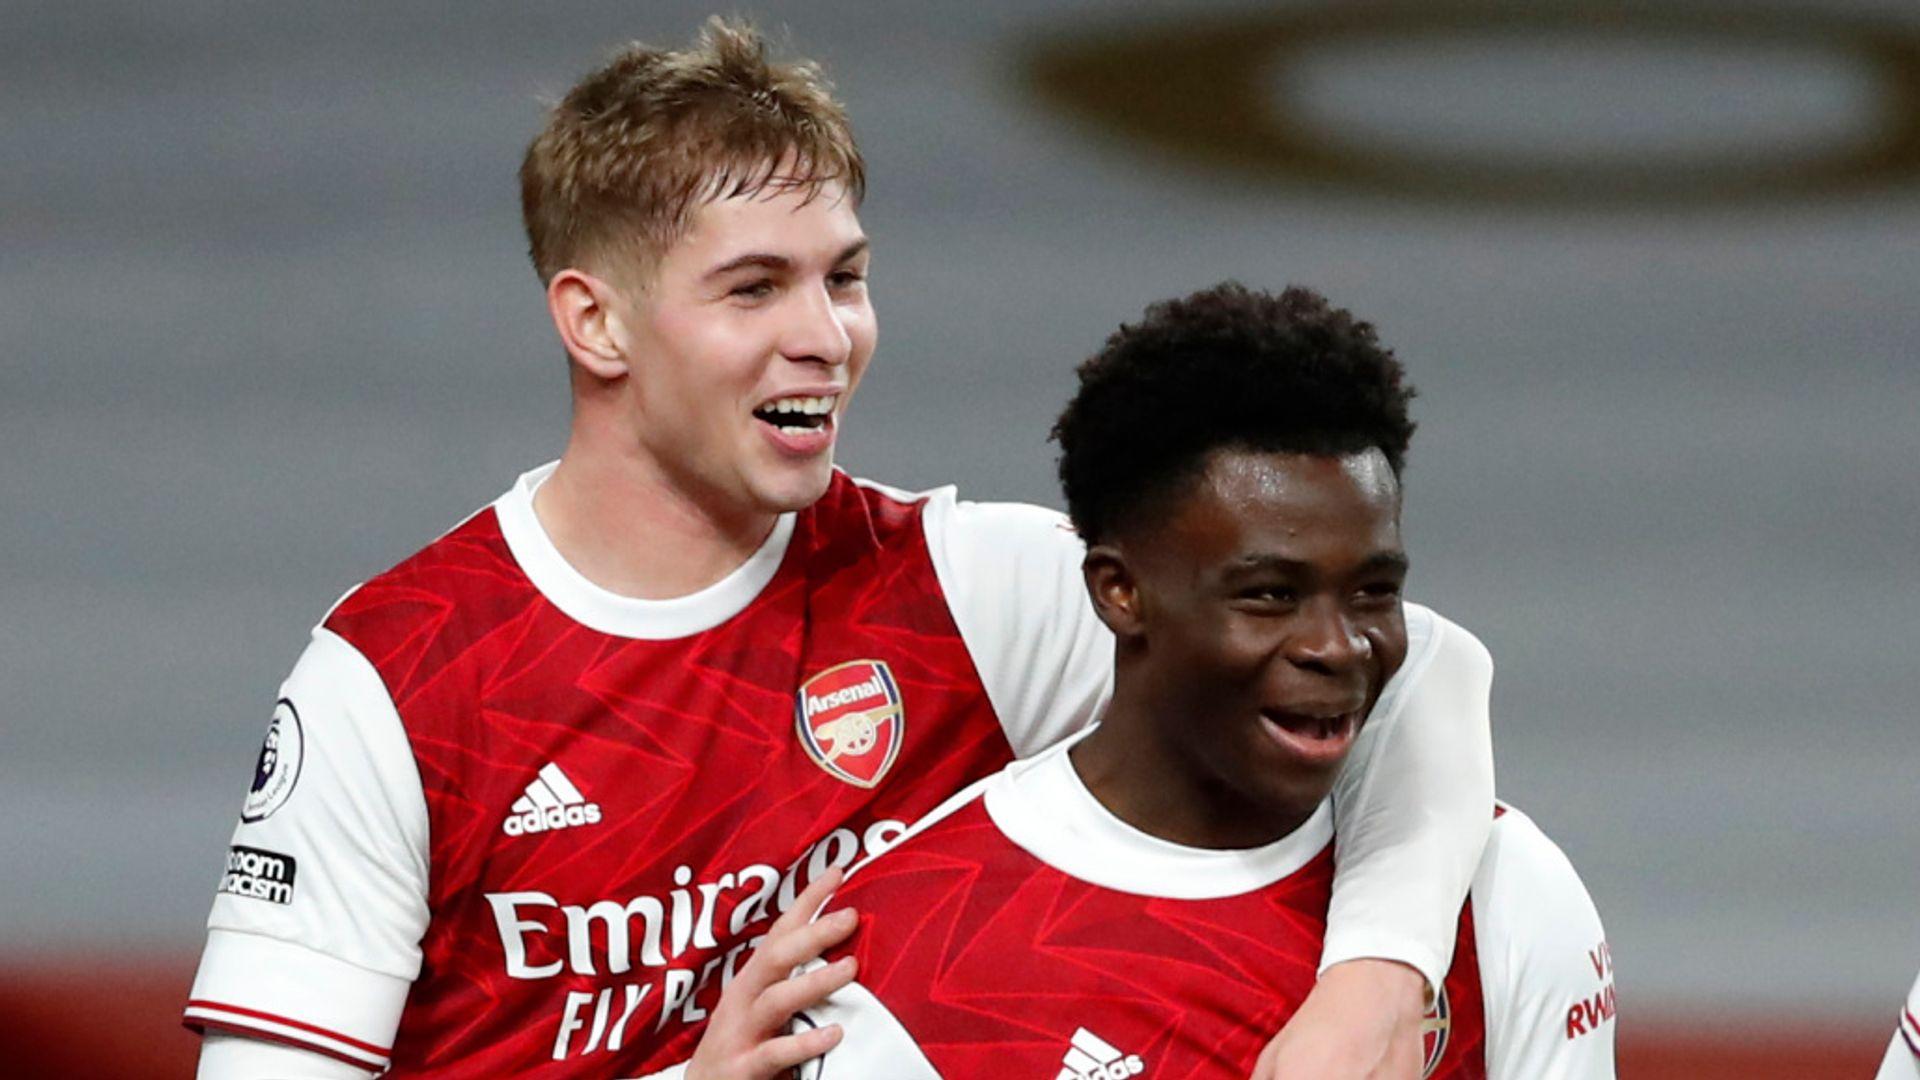 Arteta: New Arsenal generation gives me hope